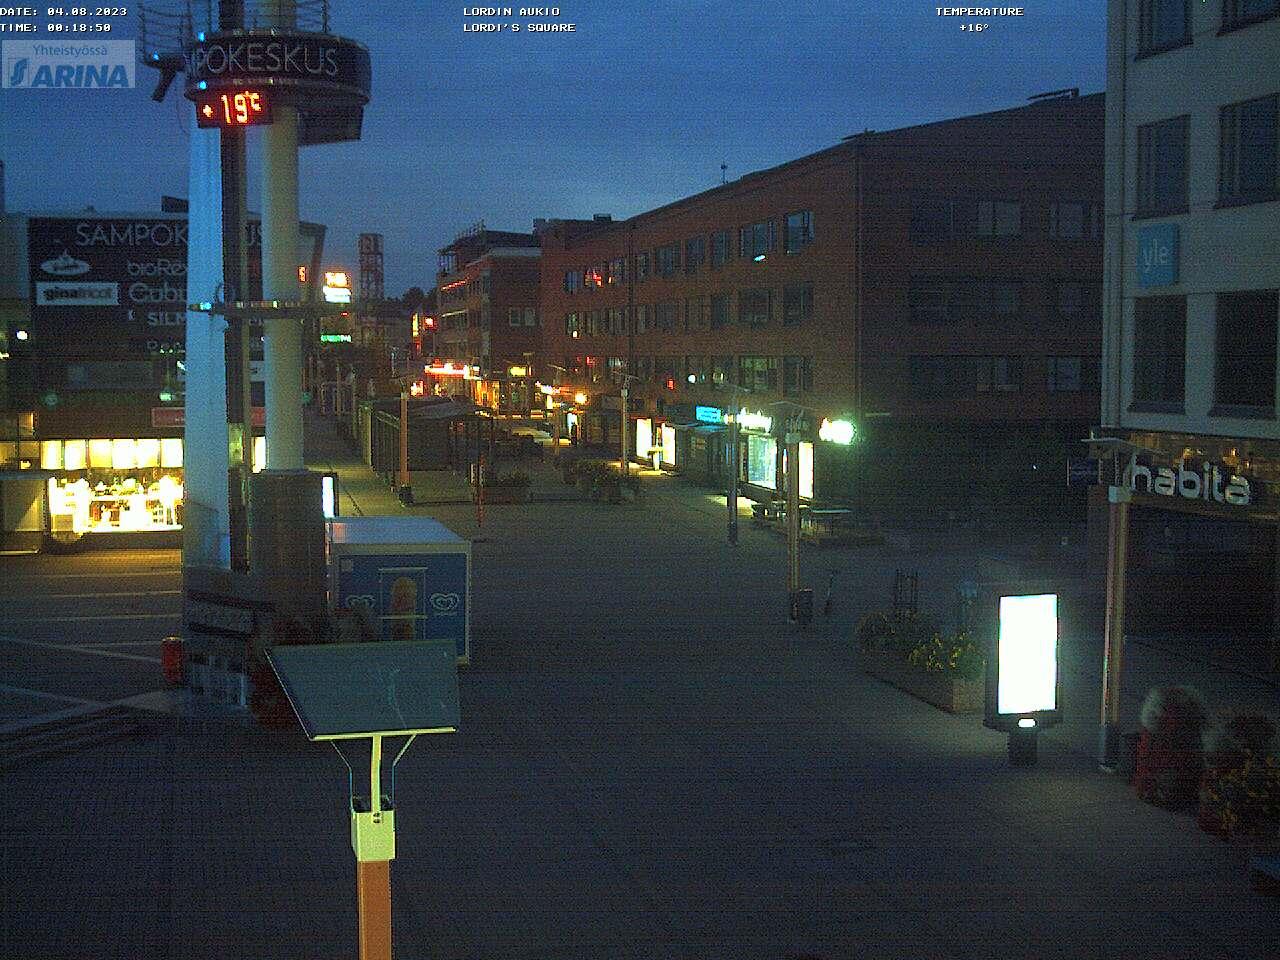 Finland Christmas Market 2019.Live Lordi Square Christmas Market Wencam Rovaniemi City